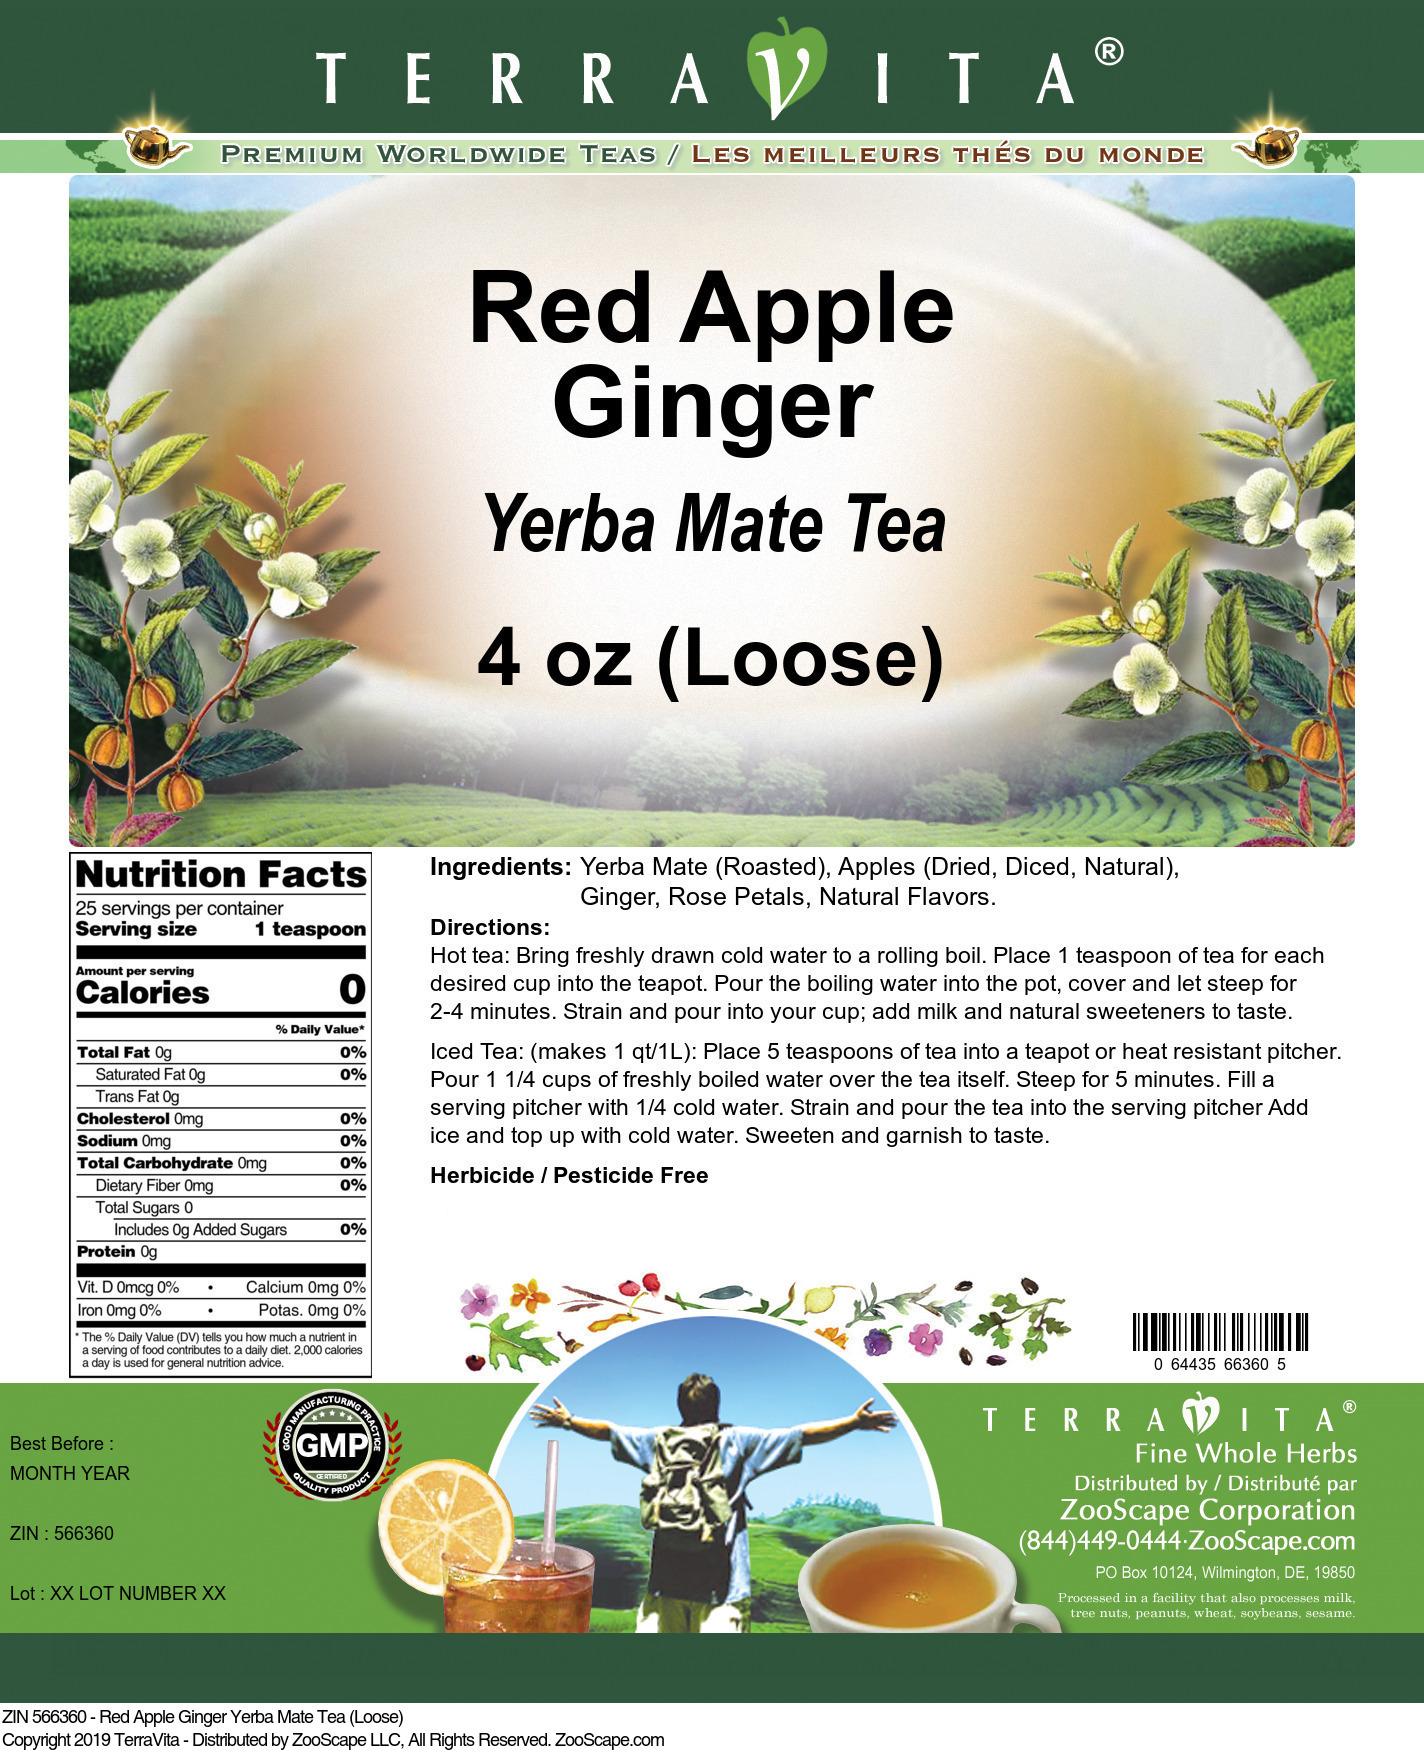 Red Apple Ginger Yerba Mate Tea (Loose)